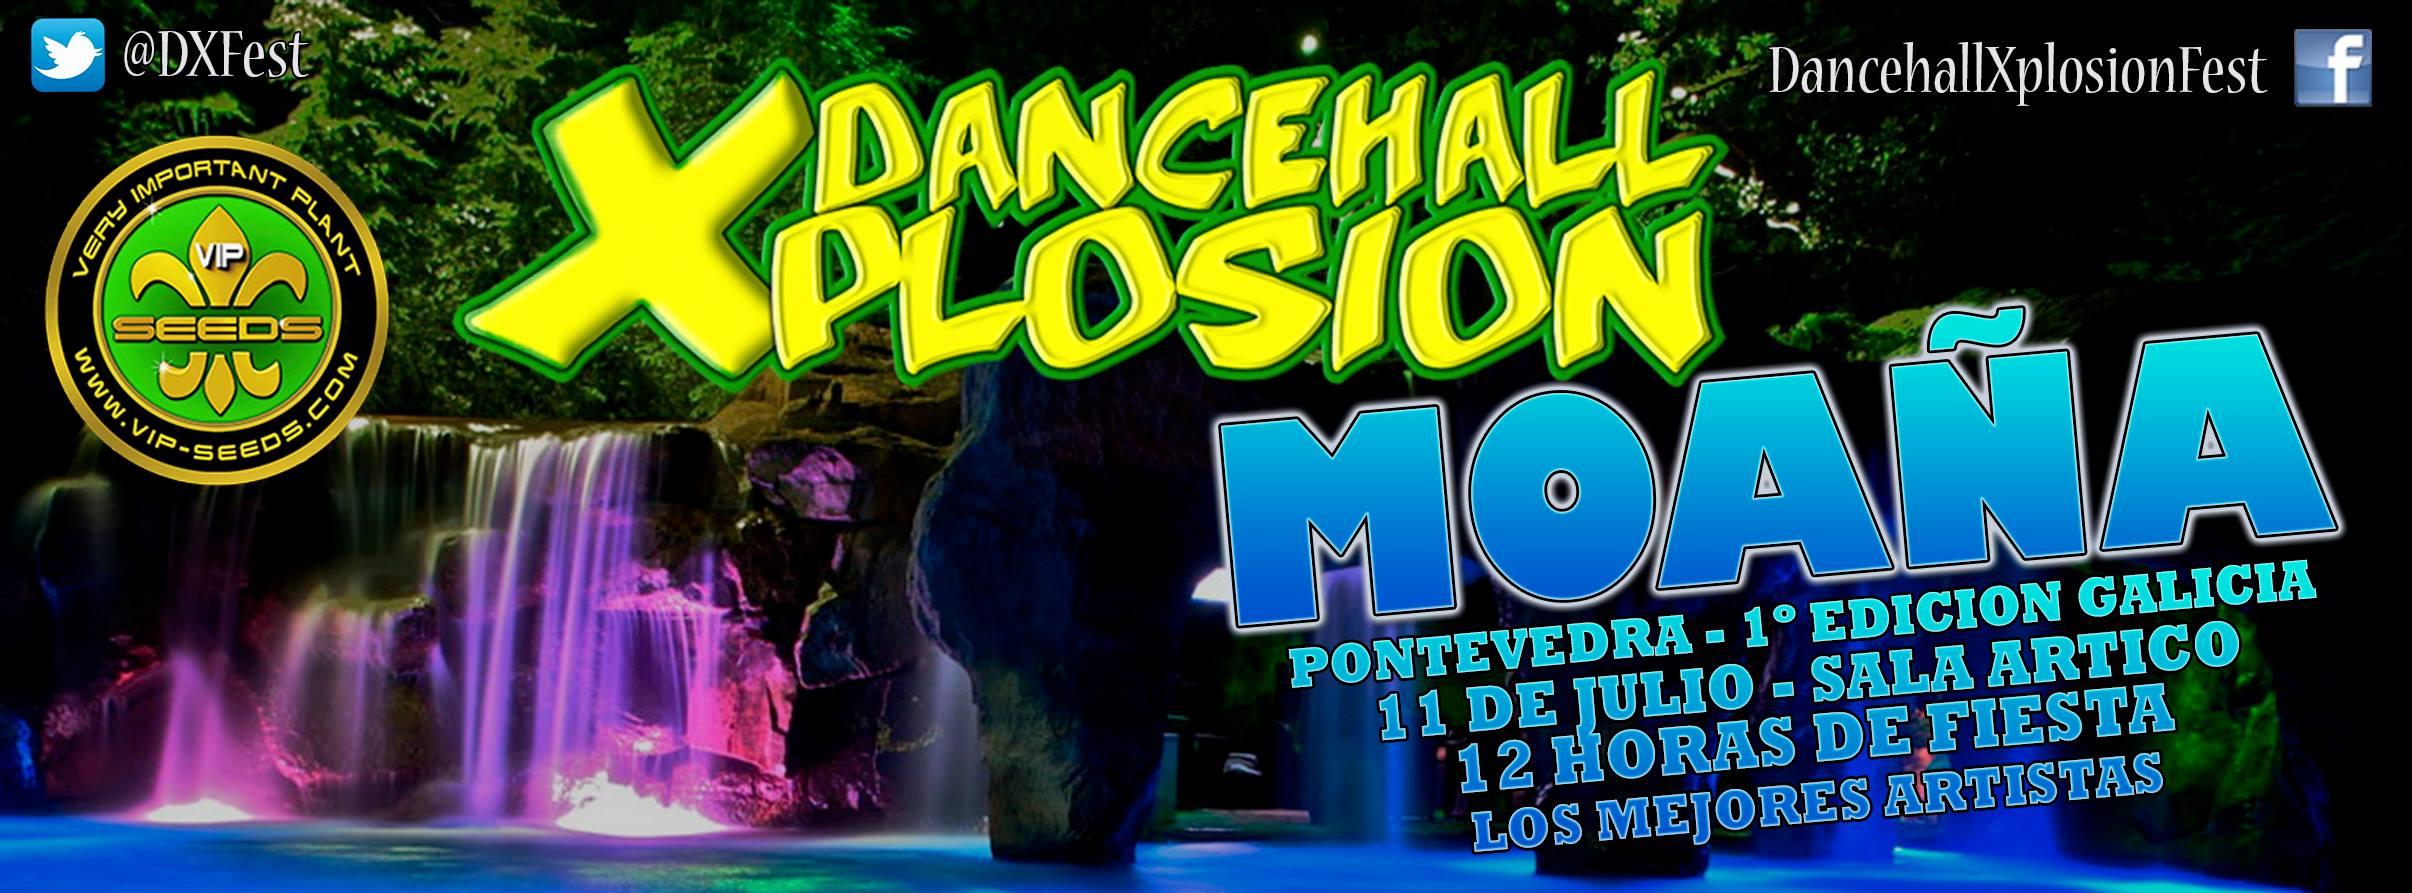 Fiesta Dancehall Xplosion